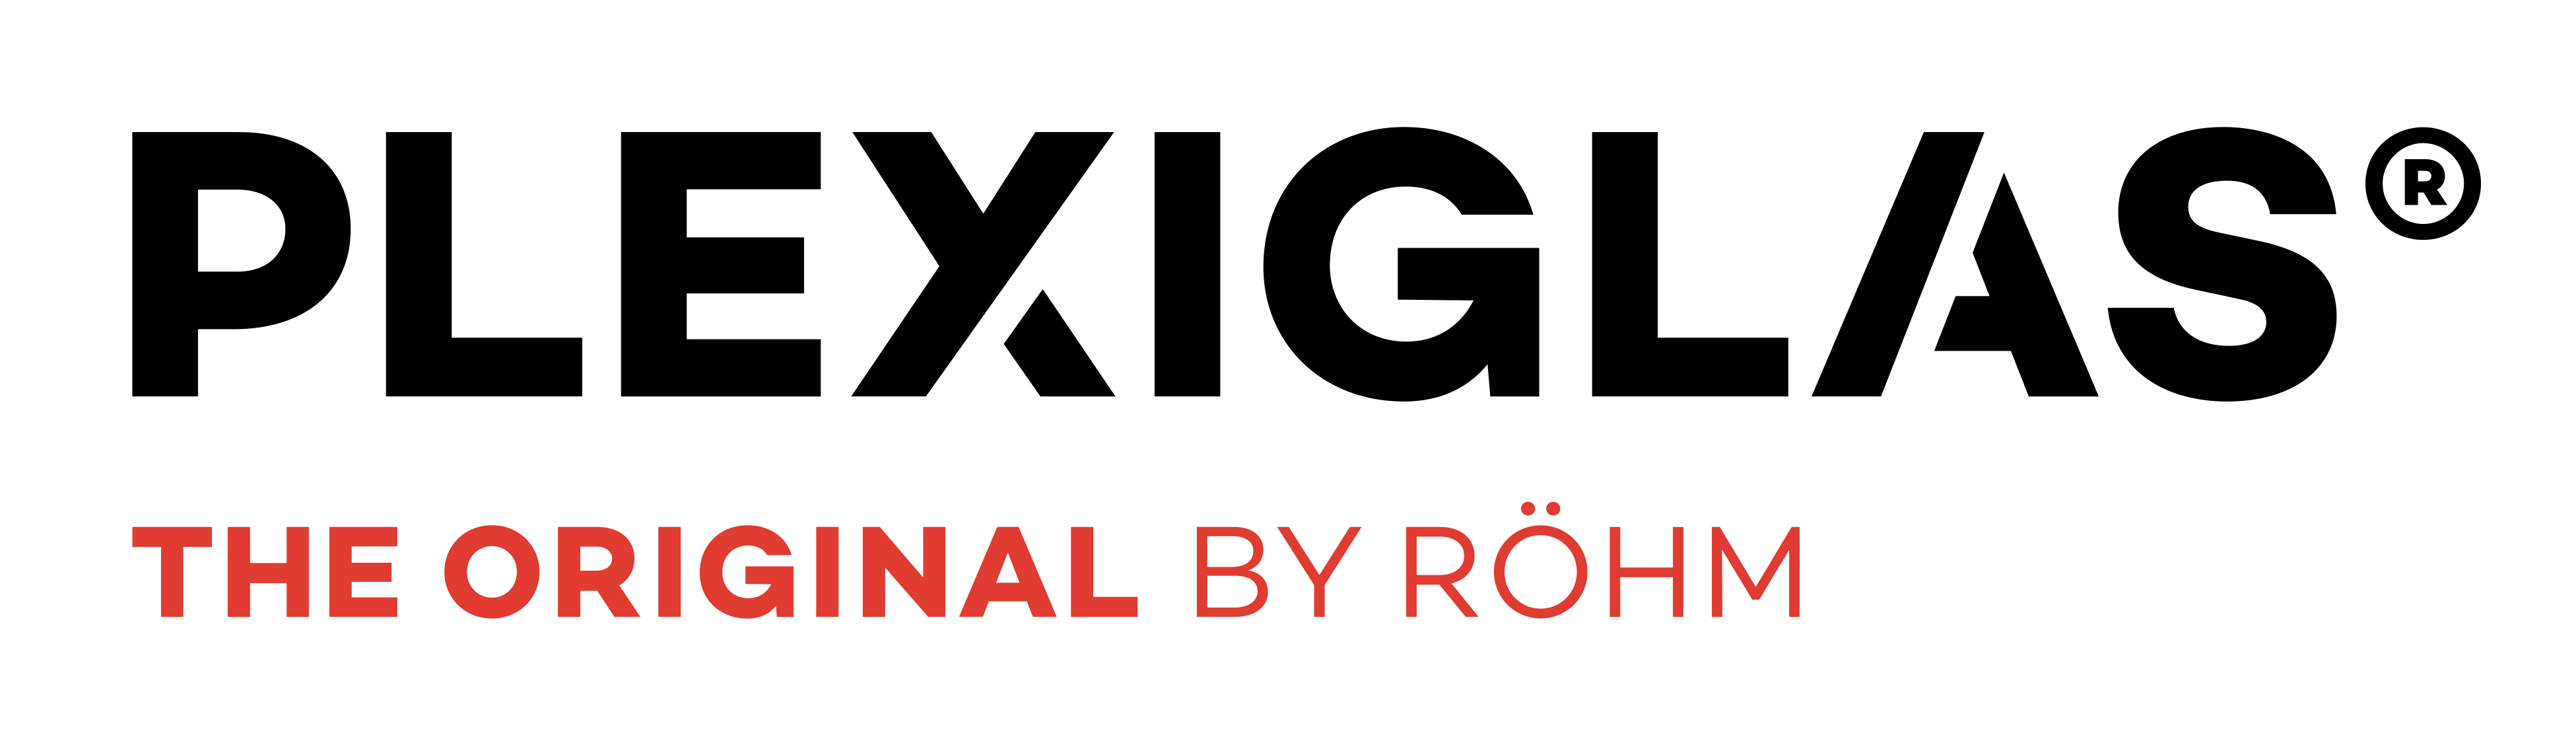 plexiglas_logo-tagline_bk-rgb_400pct